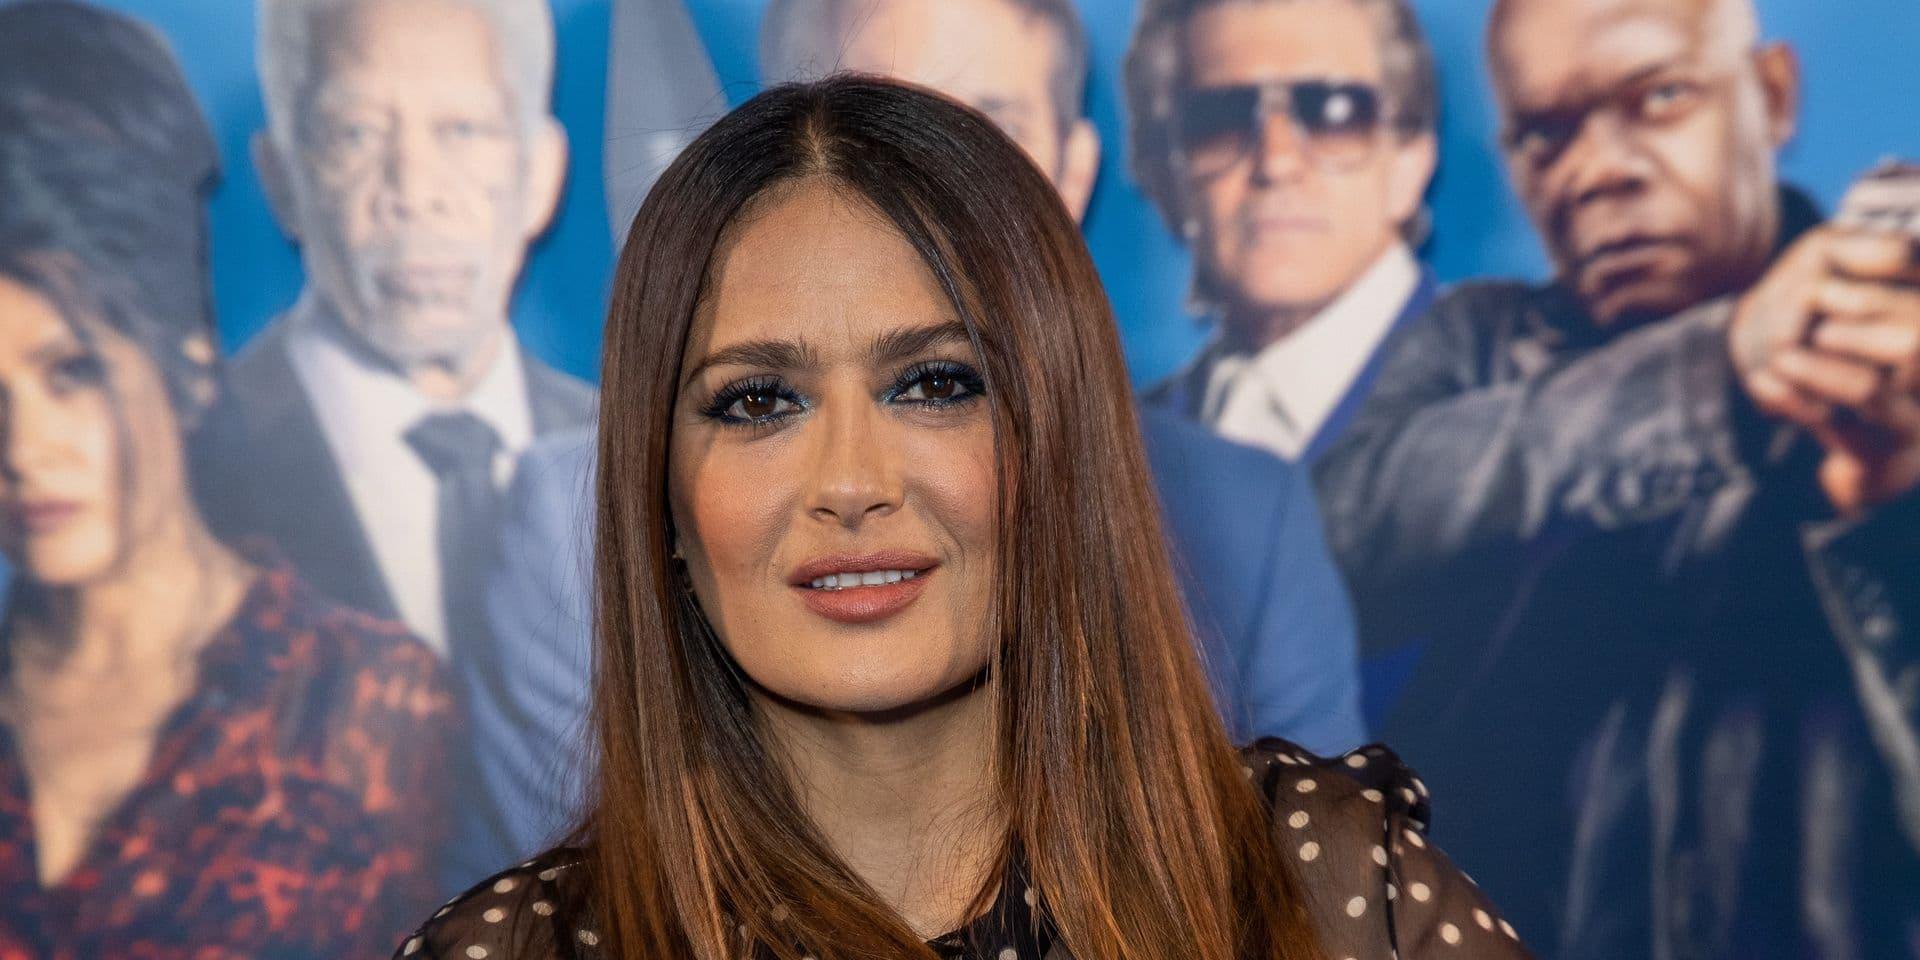 Salma Hayek attends screening